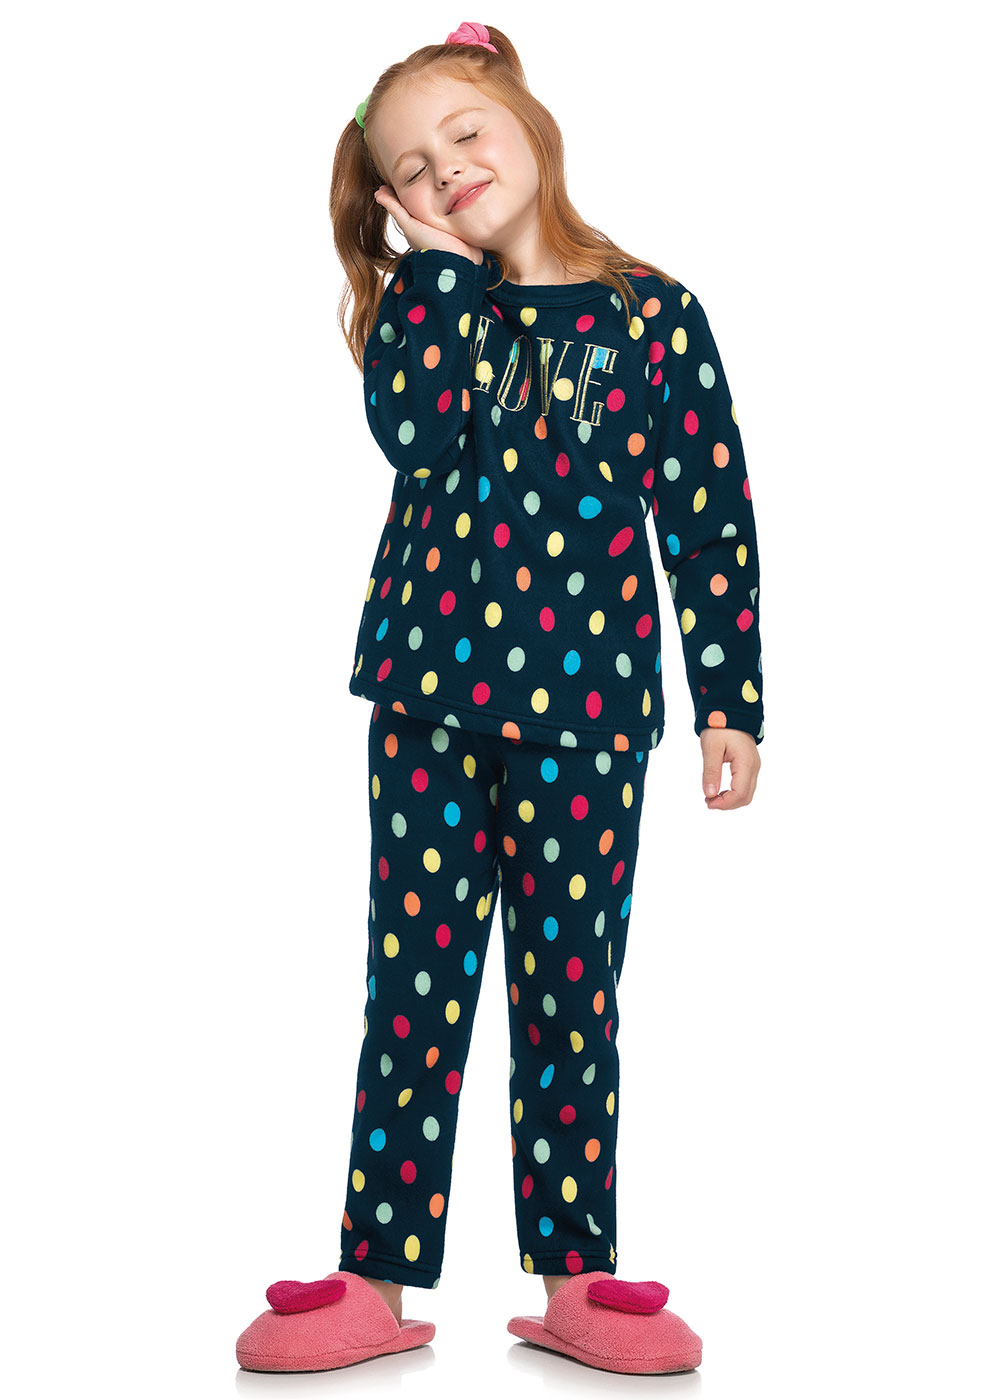 Pijama Infantil Feminino Inverno Azul Love - Elian